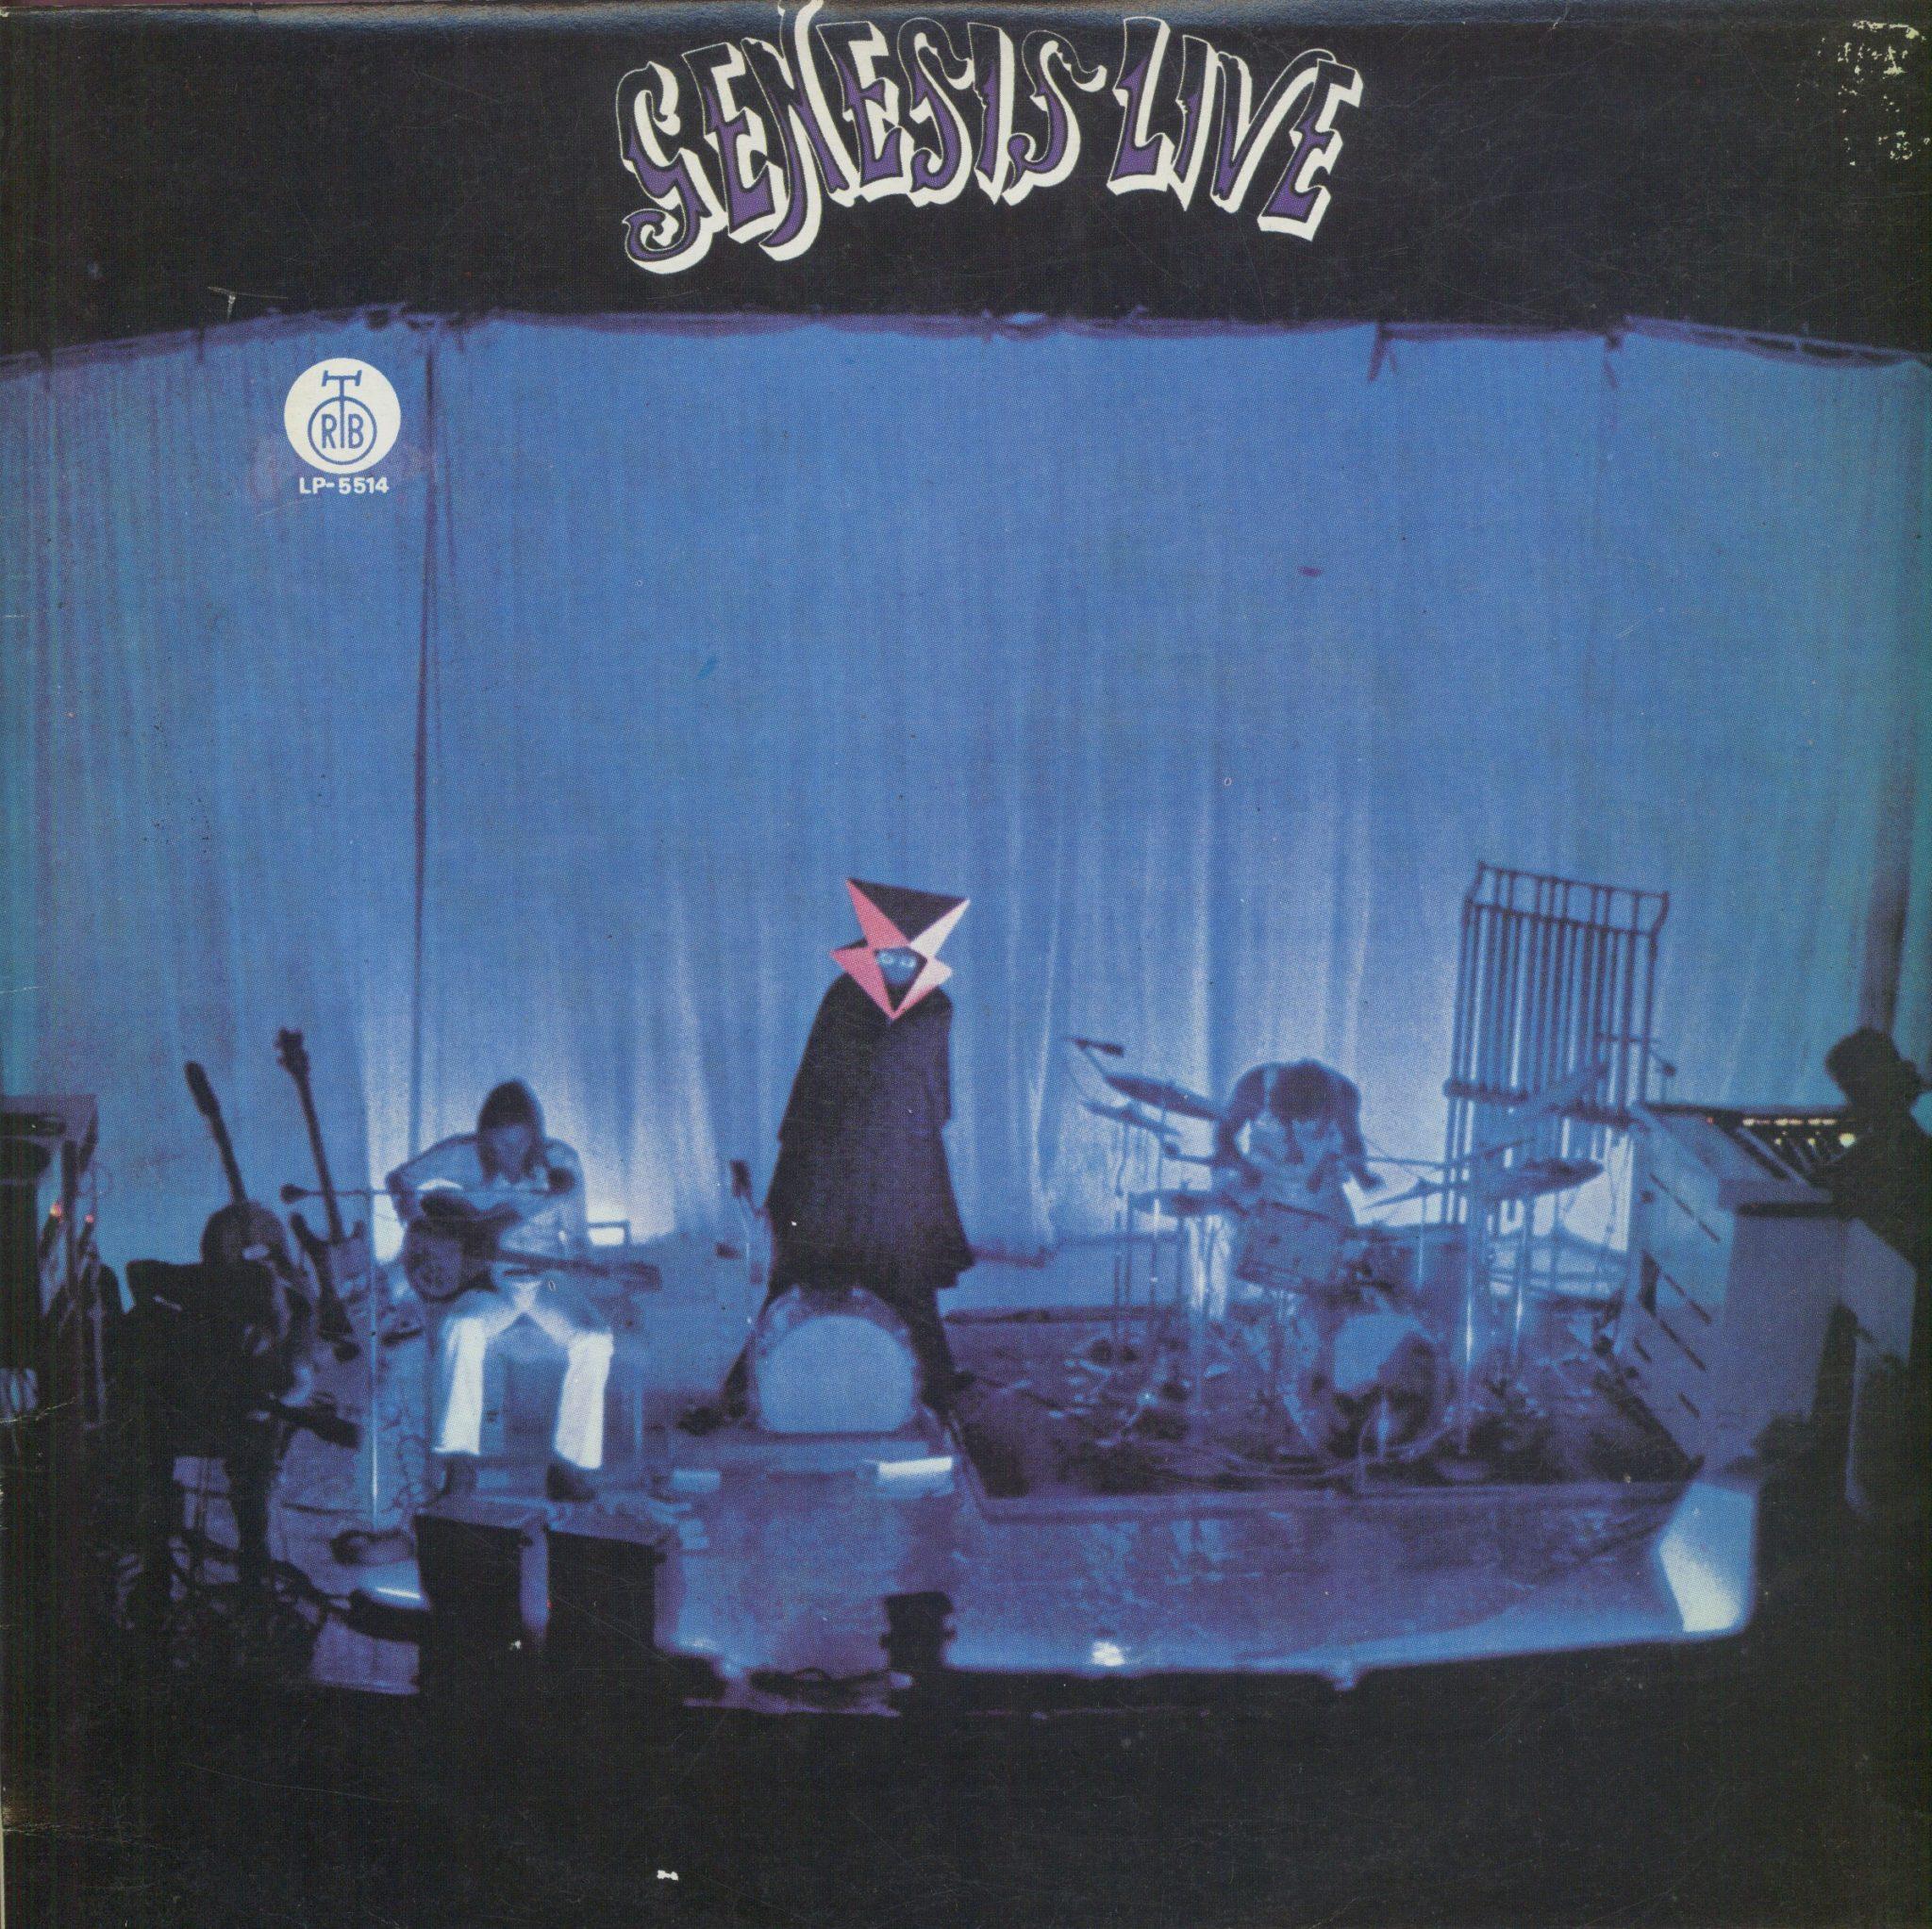 Gramofonska ploča Genesis Live LP 5514